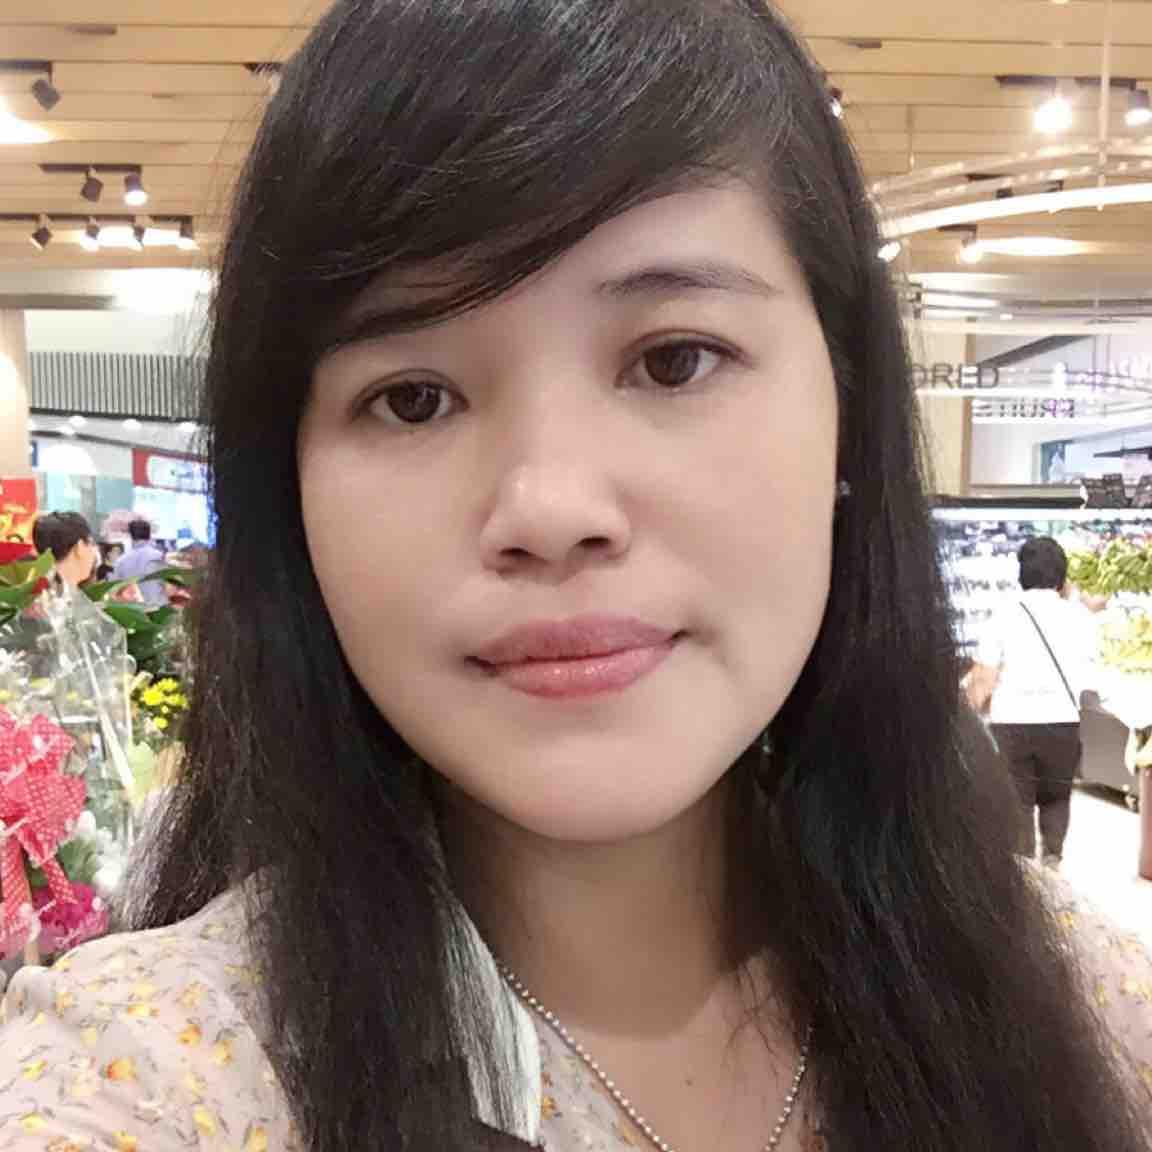 Huỳnh Nguyệt